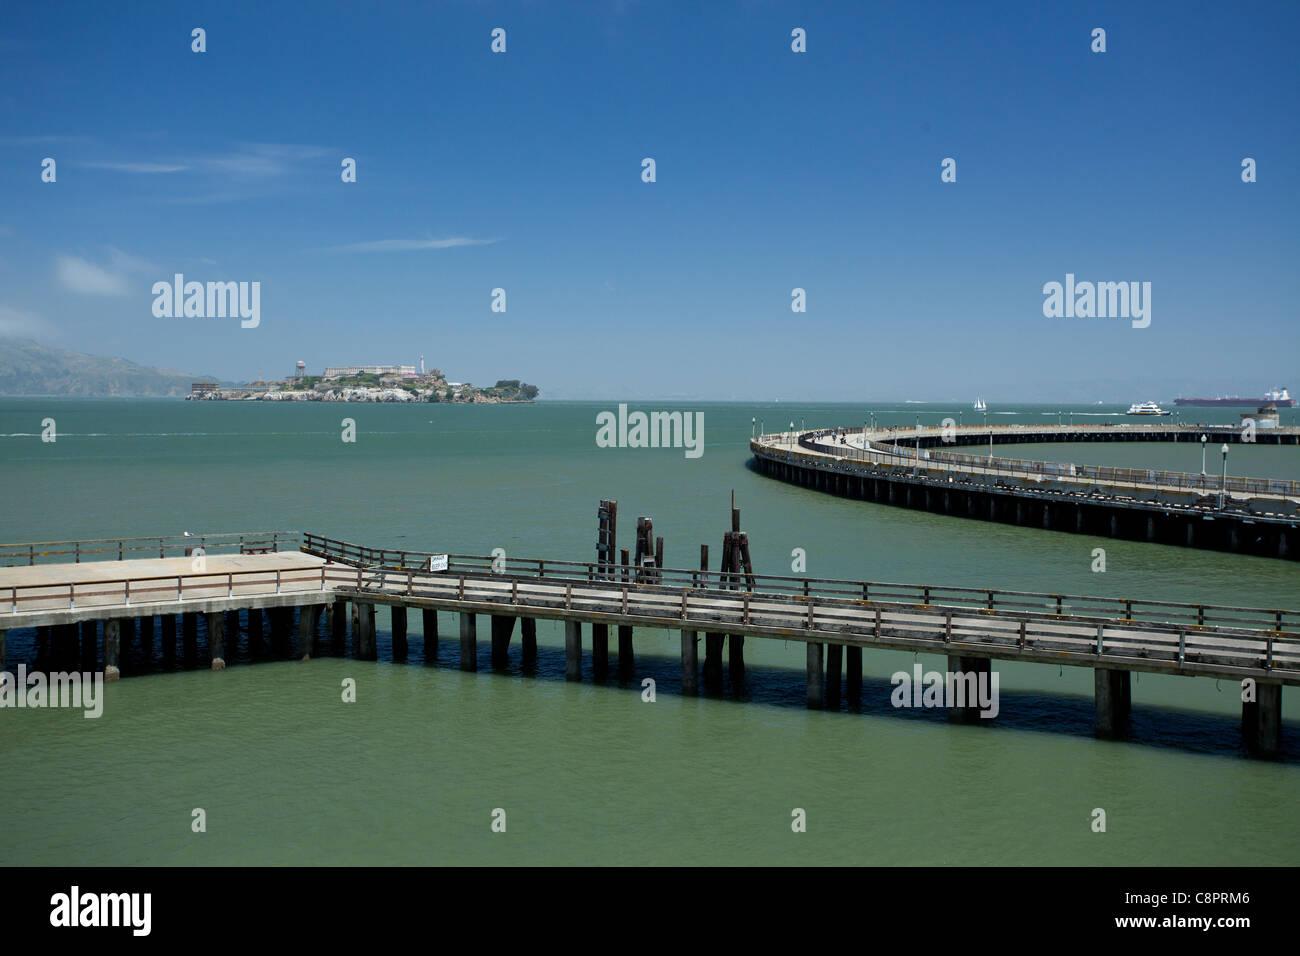 View of Alcatraz from Aquatic Park in San Francisco Stock Photo